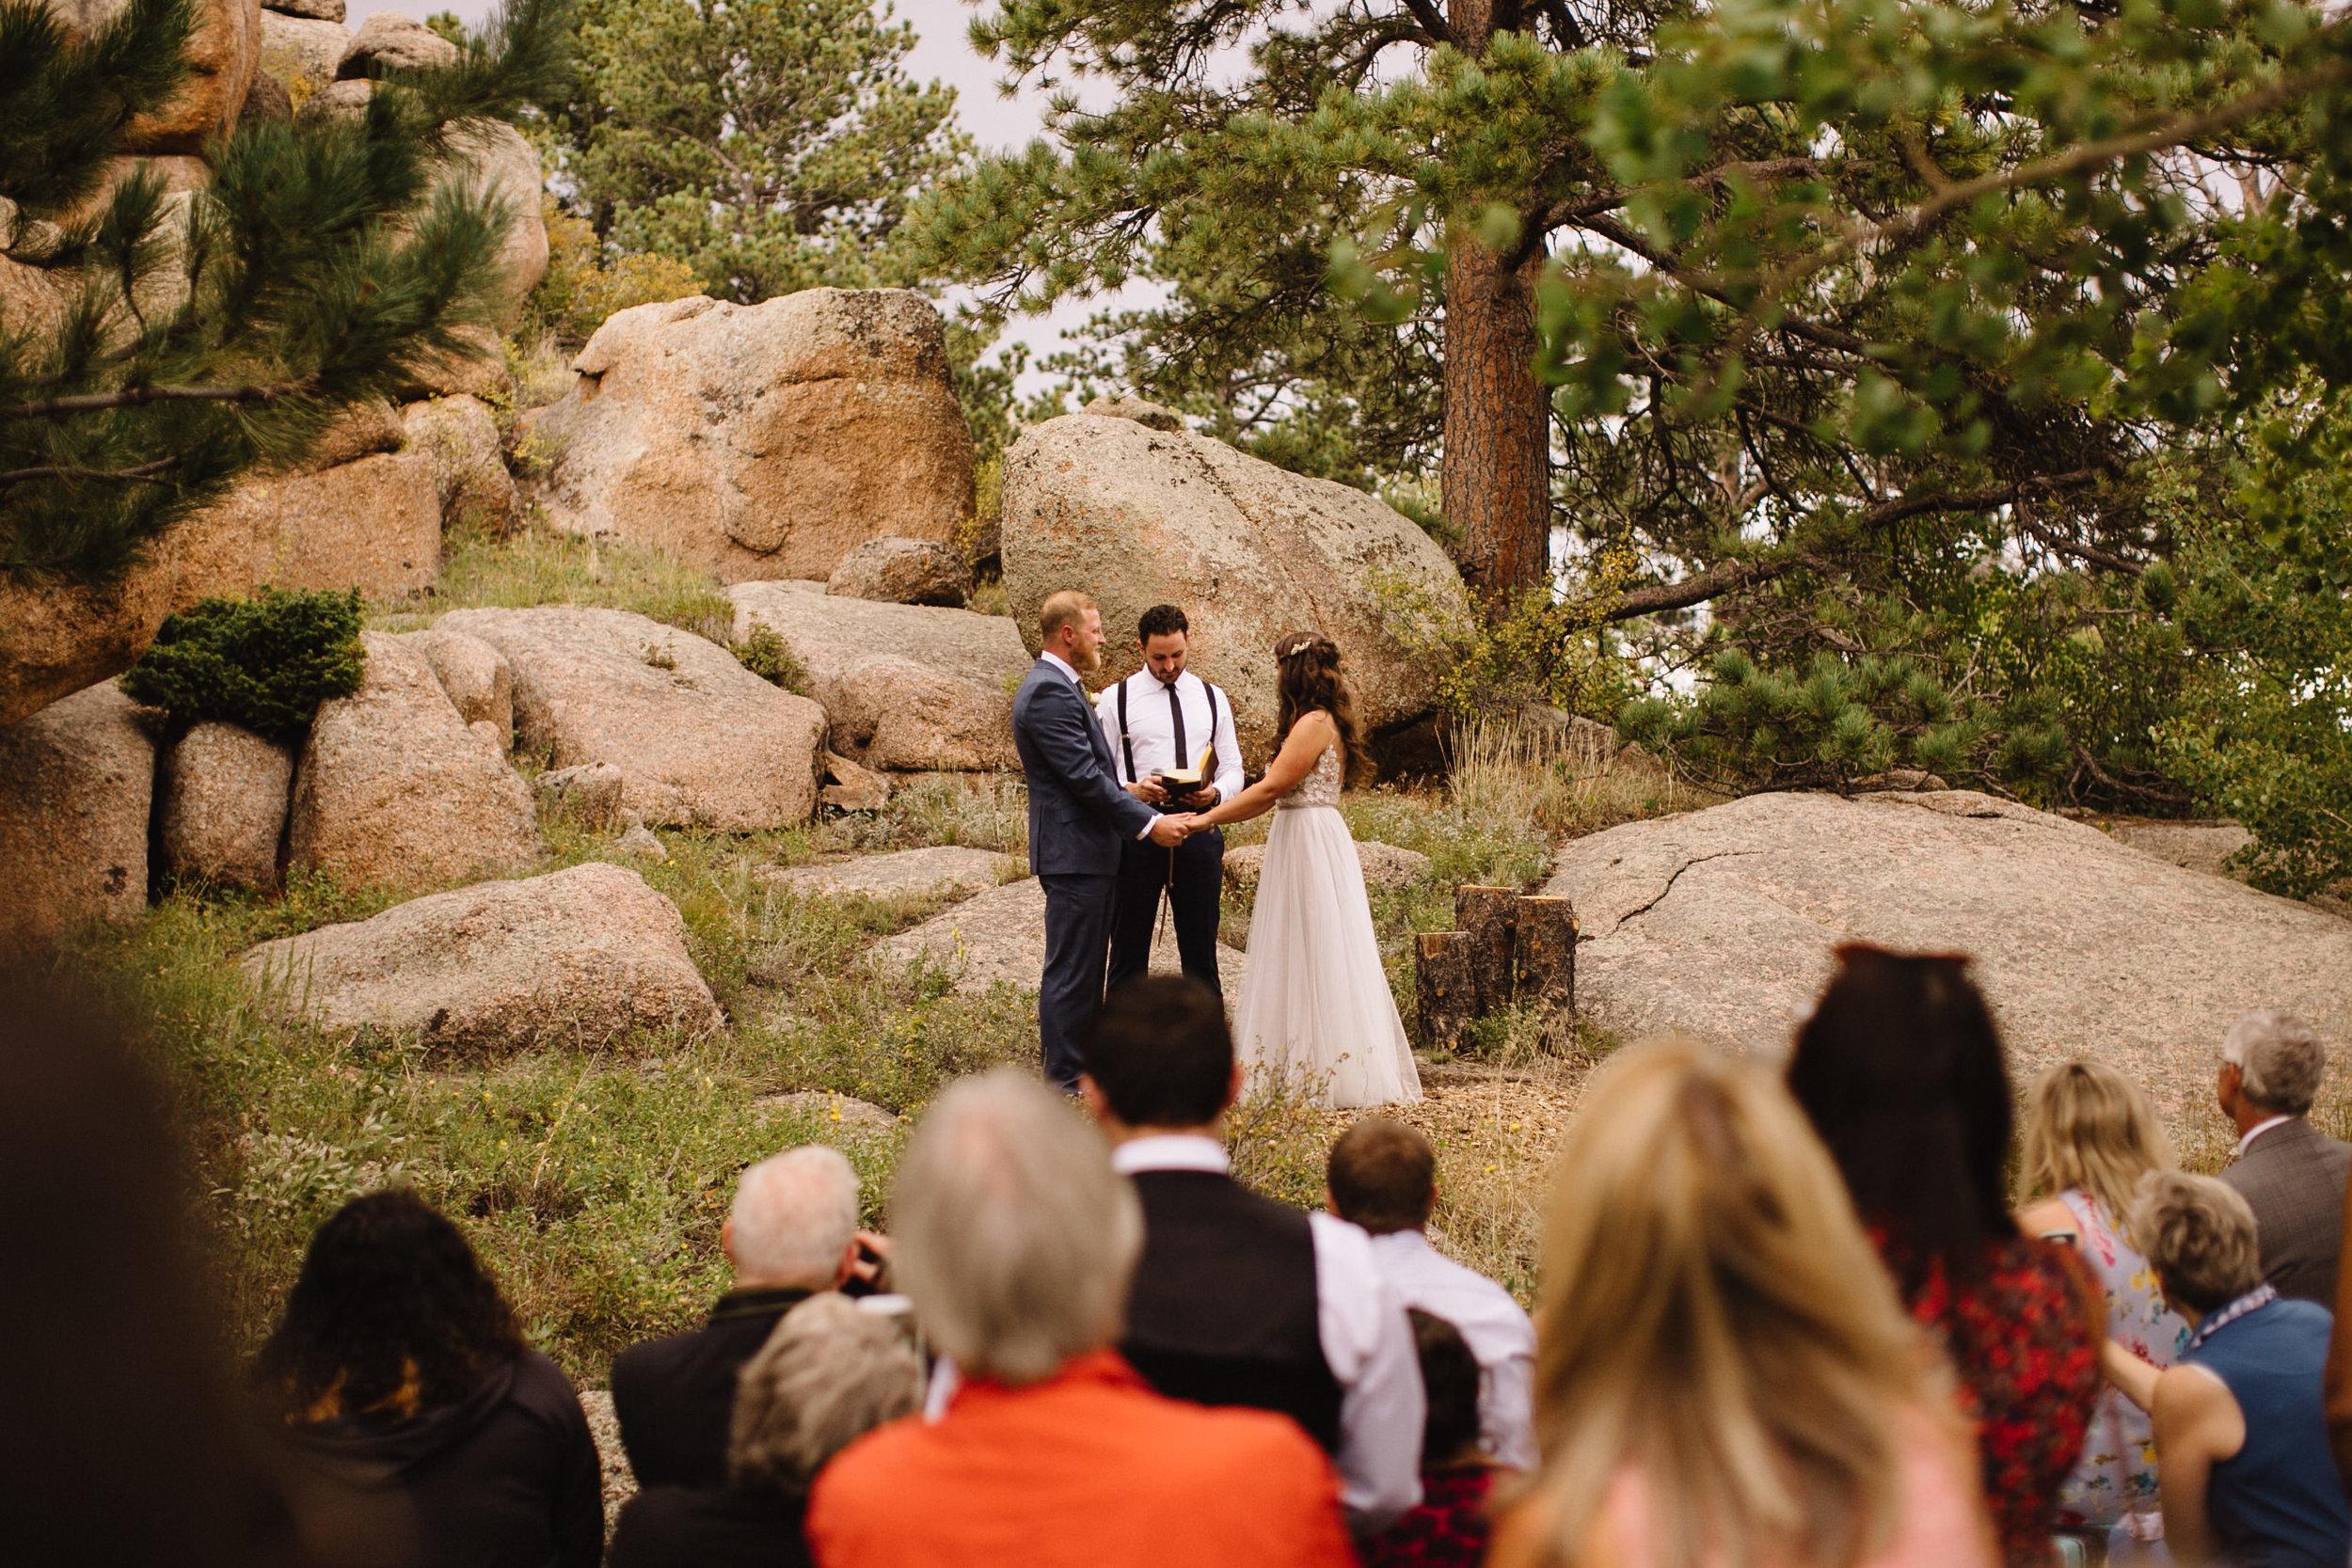 Liz Osban Photography Vedauwoo Buford Wyoming Happy Jack Wedding Elopement Destination Small Forest Cheyenne Laramie Medicine Bow National Forest Ceremony Sarah Taylor5.jpg